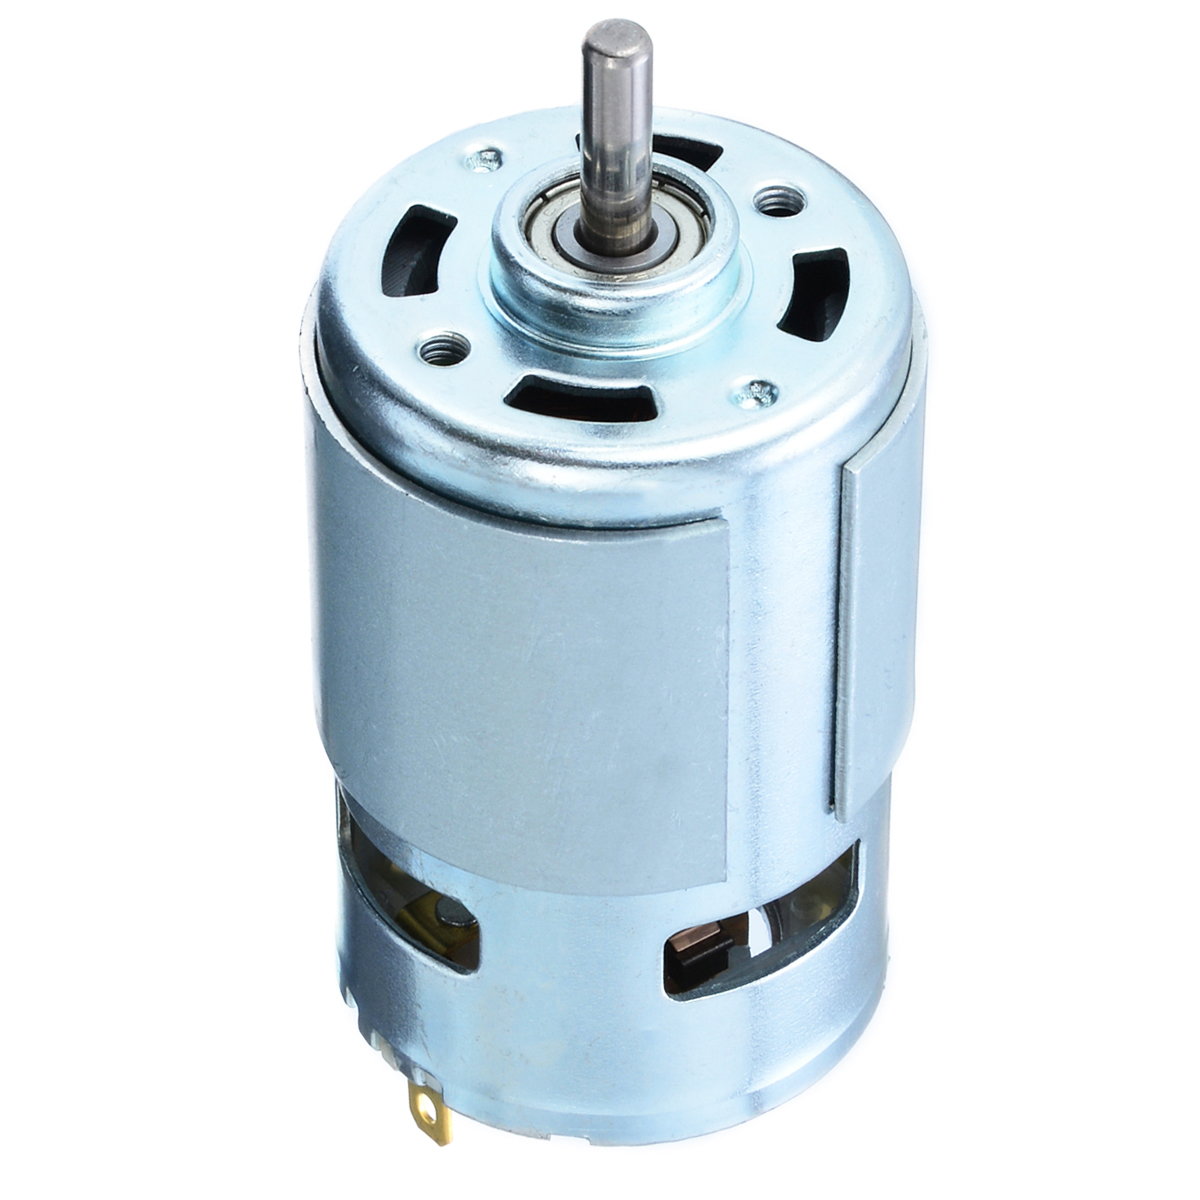 Miniature DC Motor DC12V - 24V 150W 13000-15000RPM 775 Micro High Speed Power Motor 5mm Shaft Electric Equipment ToolMiniature DC Motor DC12V - 24V 150W 13000-15000RPM 775 Micro High Speed Power Motor 5mm Shaft Electric Equipment Tool